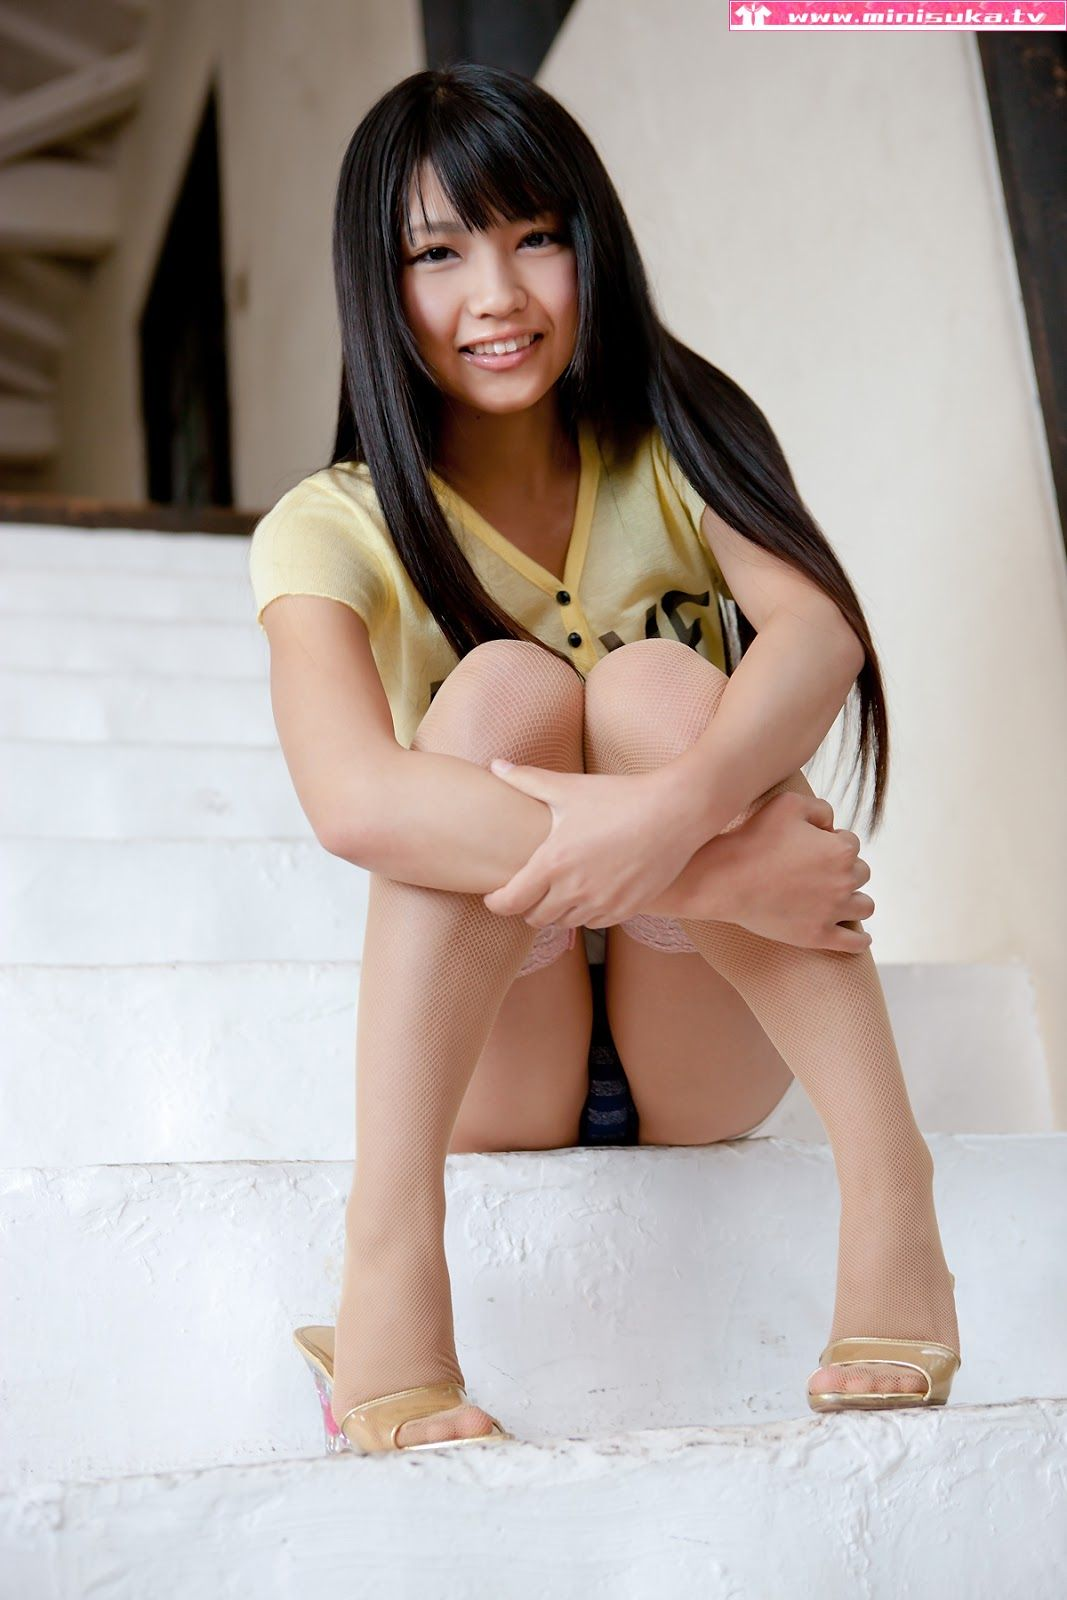 Imouto Tv Minisuka Tv Japanese Girls Victoria Secret